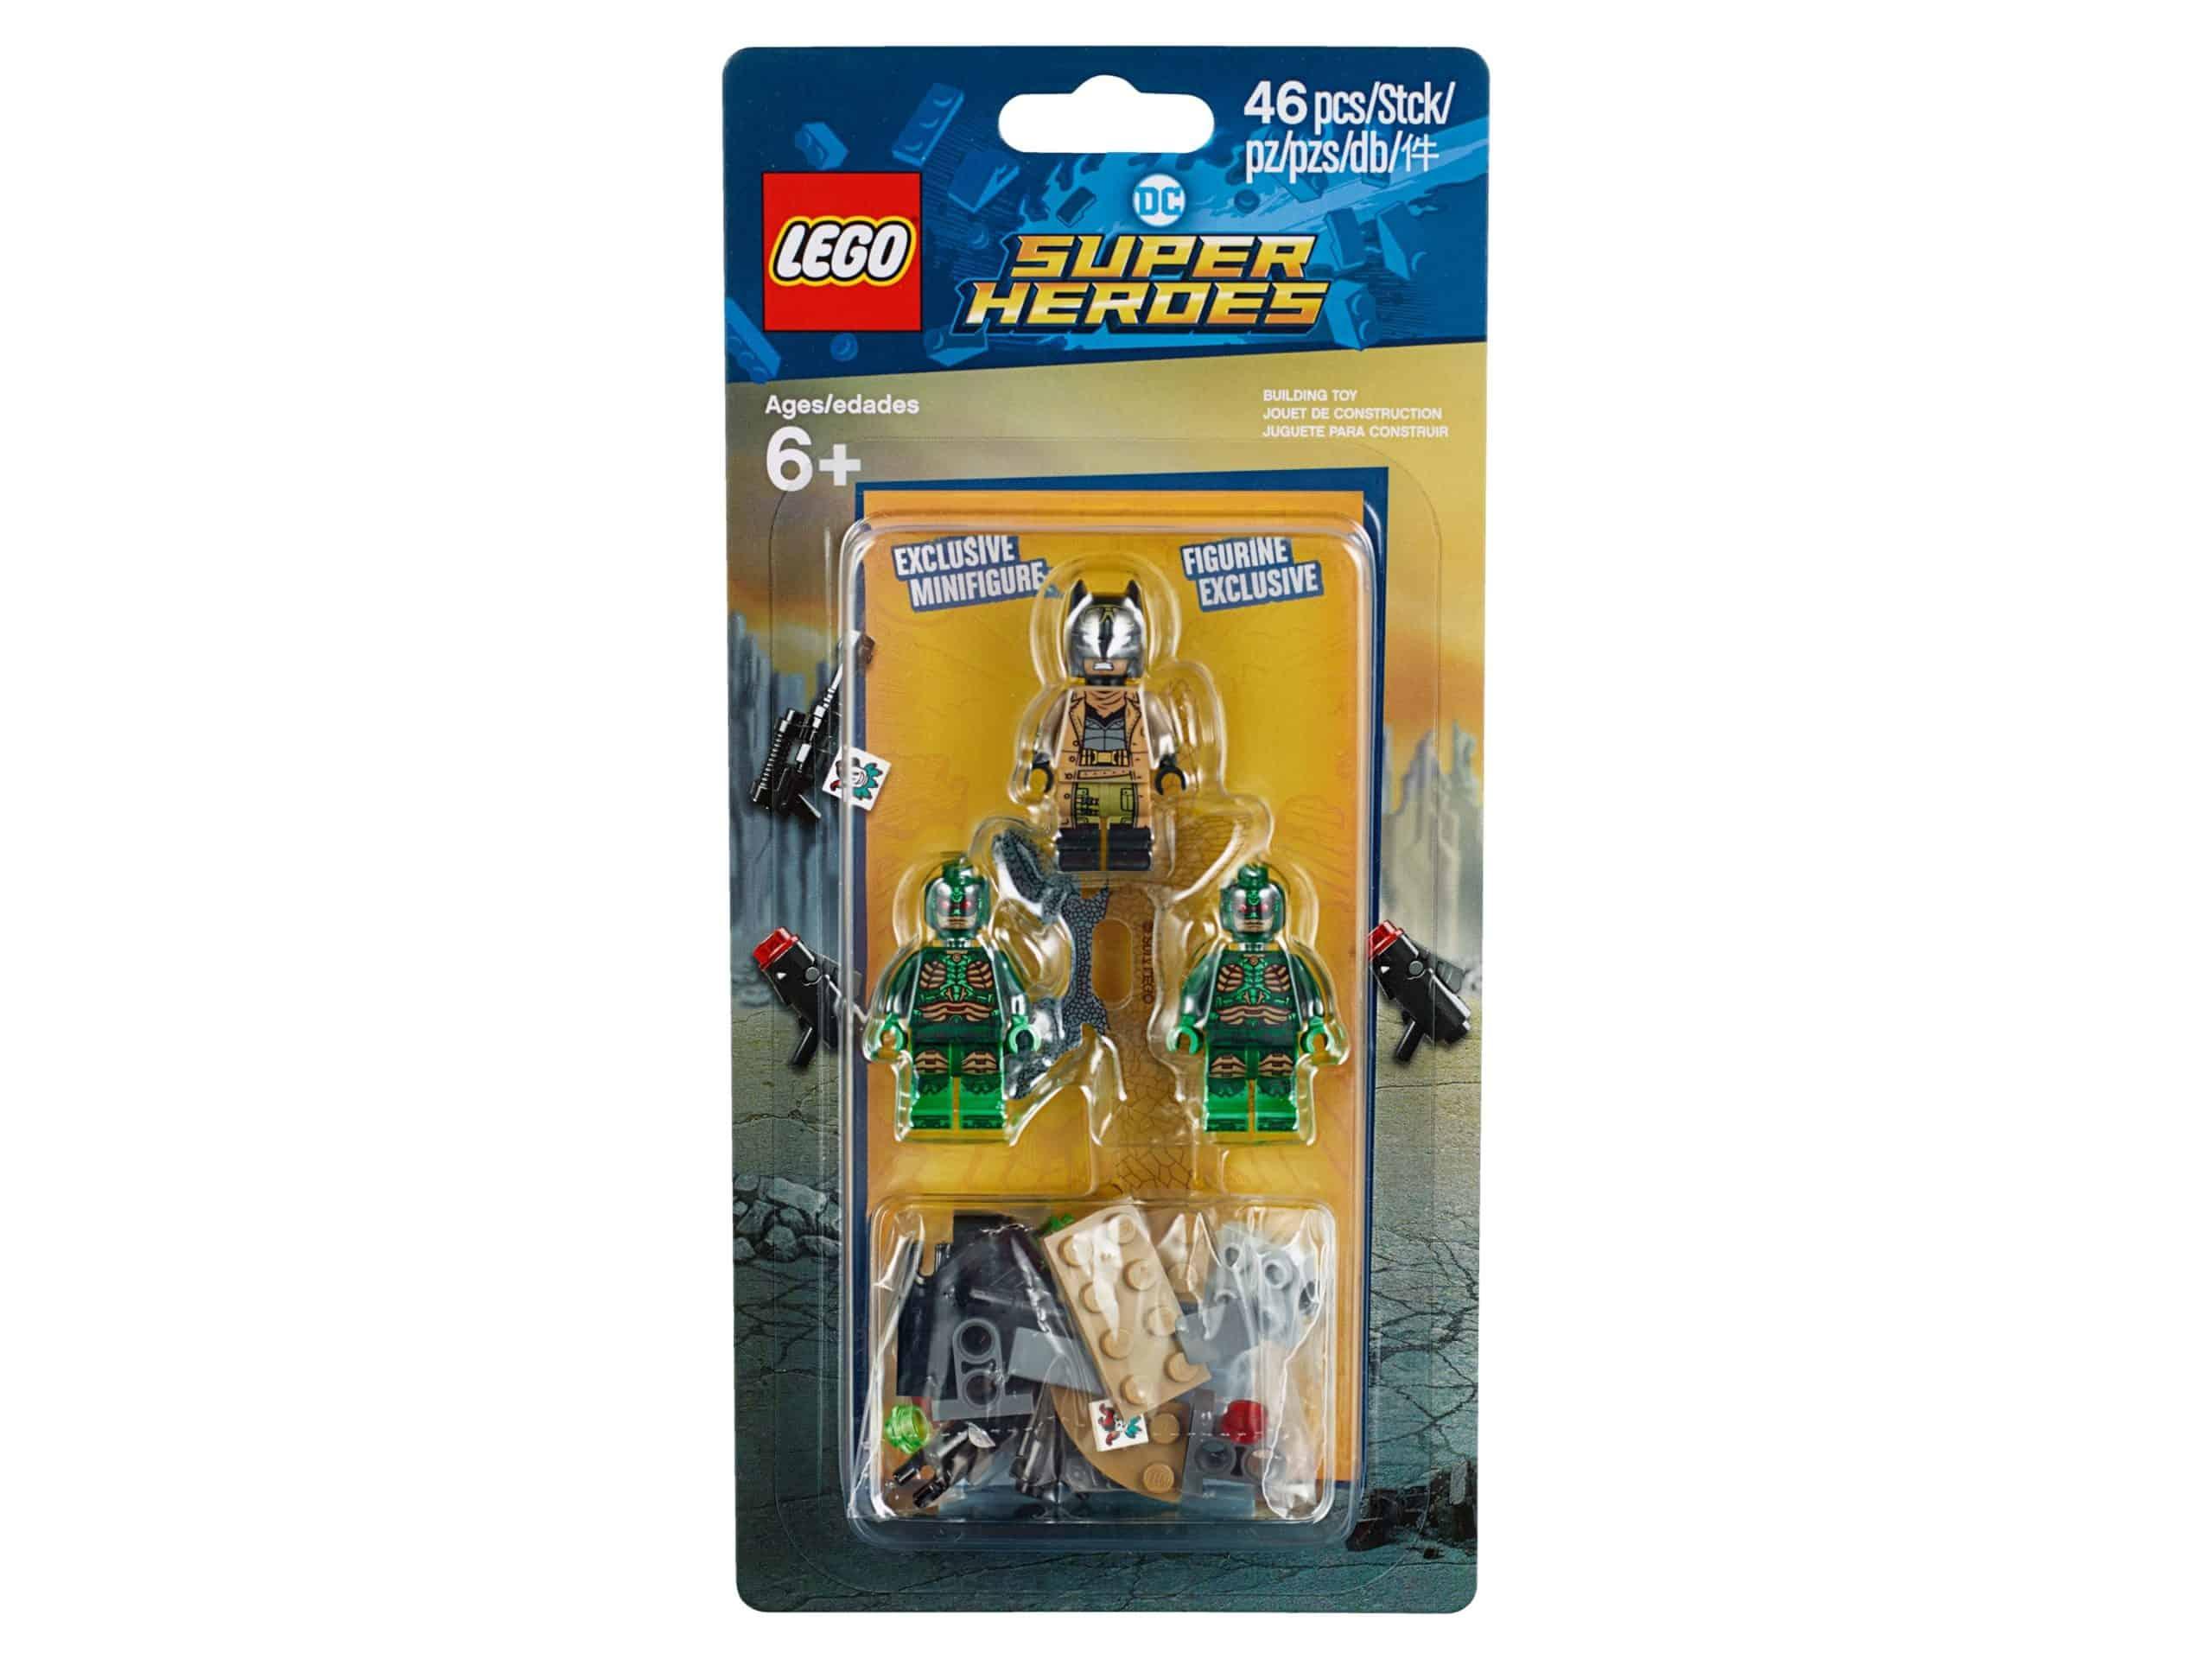 lego knightmare batman accessoireset 2018 853744 scaled